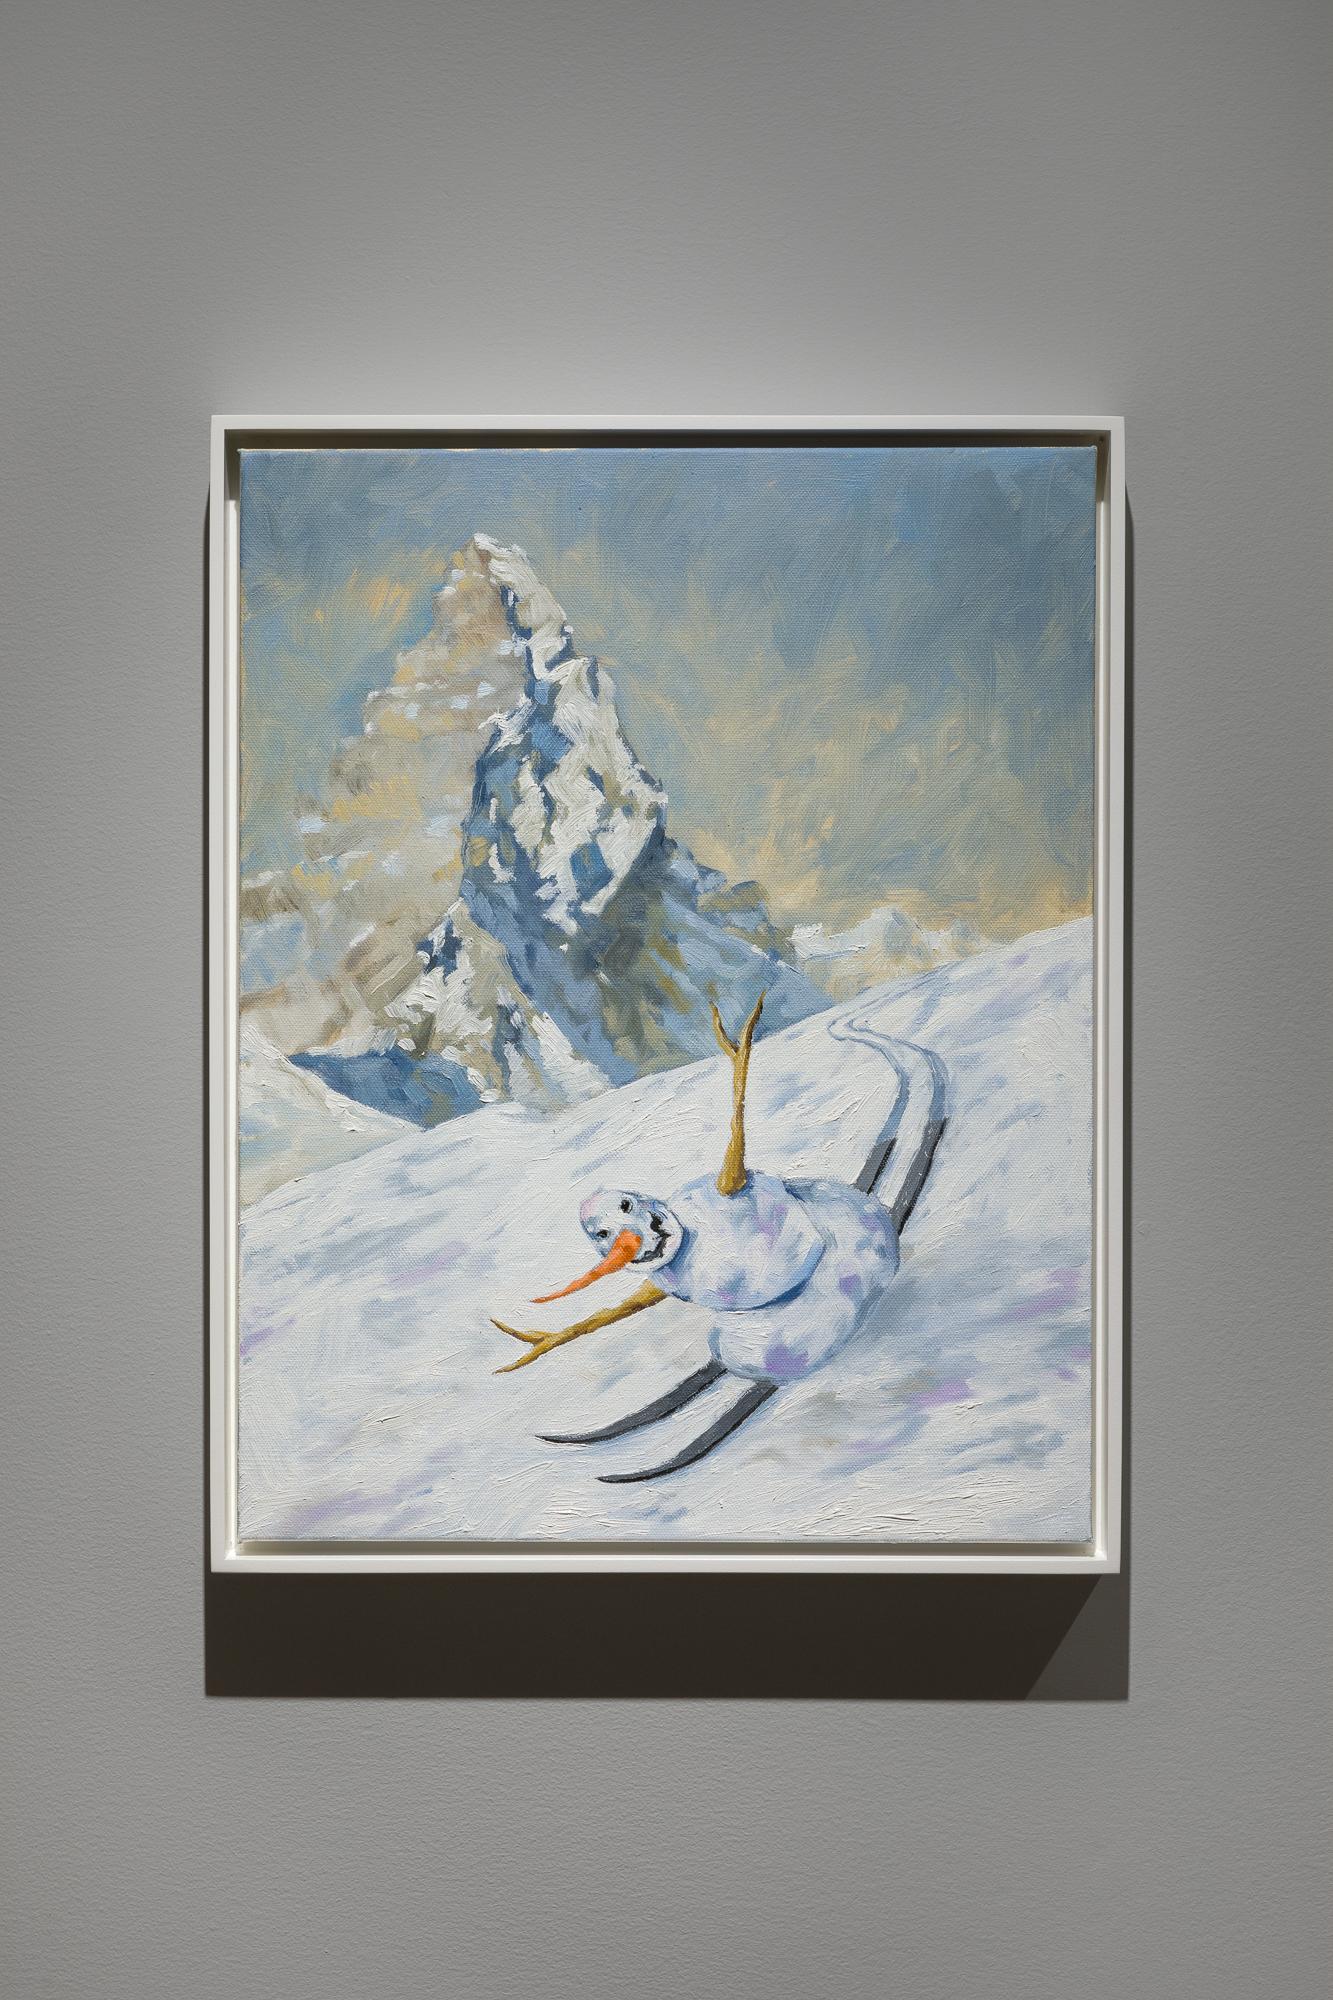 Jan Kiefer: Skiing Snowman Swiss Institute